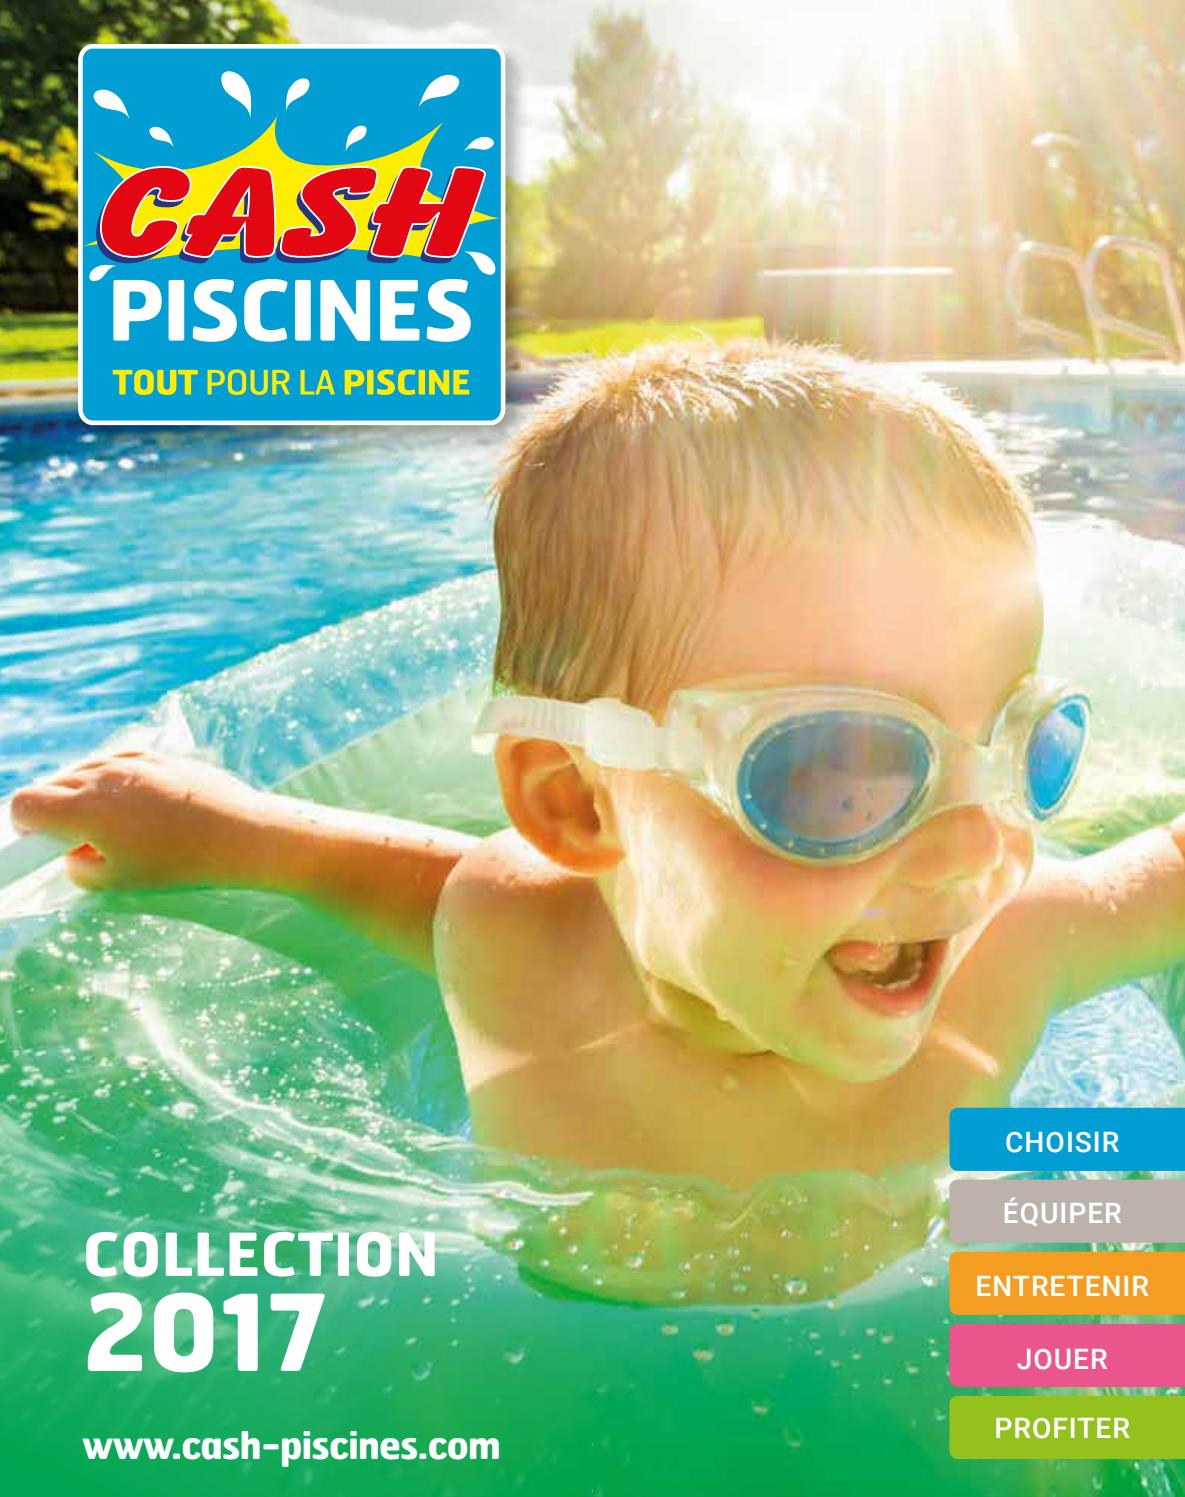 Catalogue Cash Piscine 2017 By Octave Octave - Issuu dedans Cash Piscine Montauban